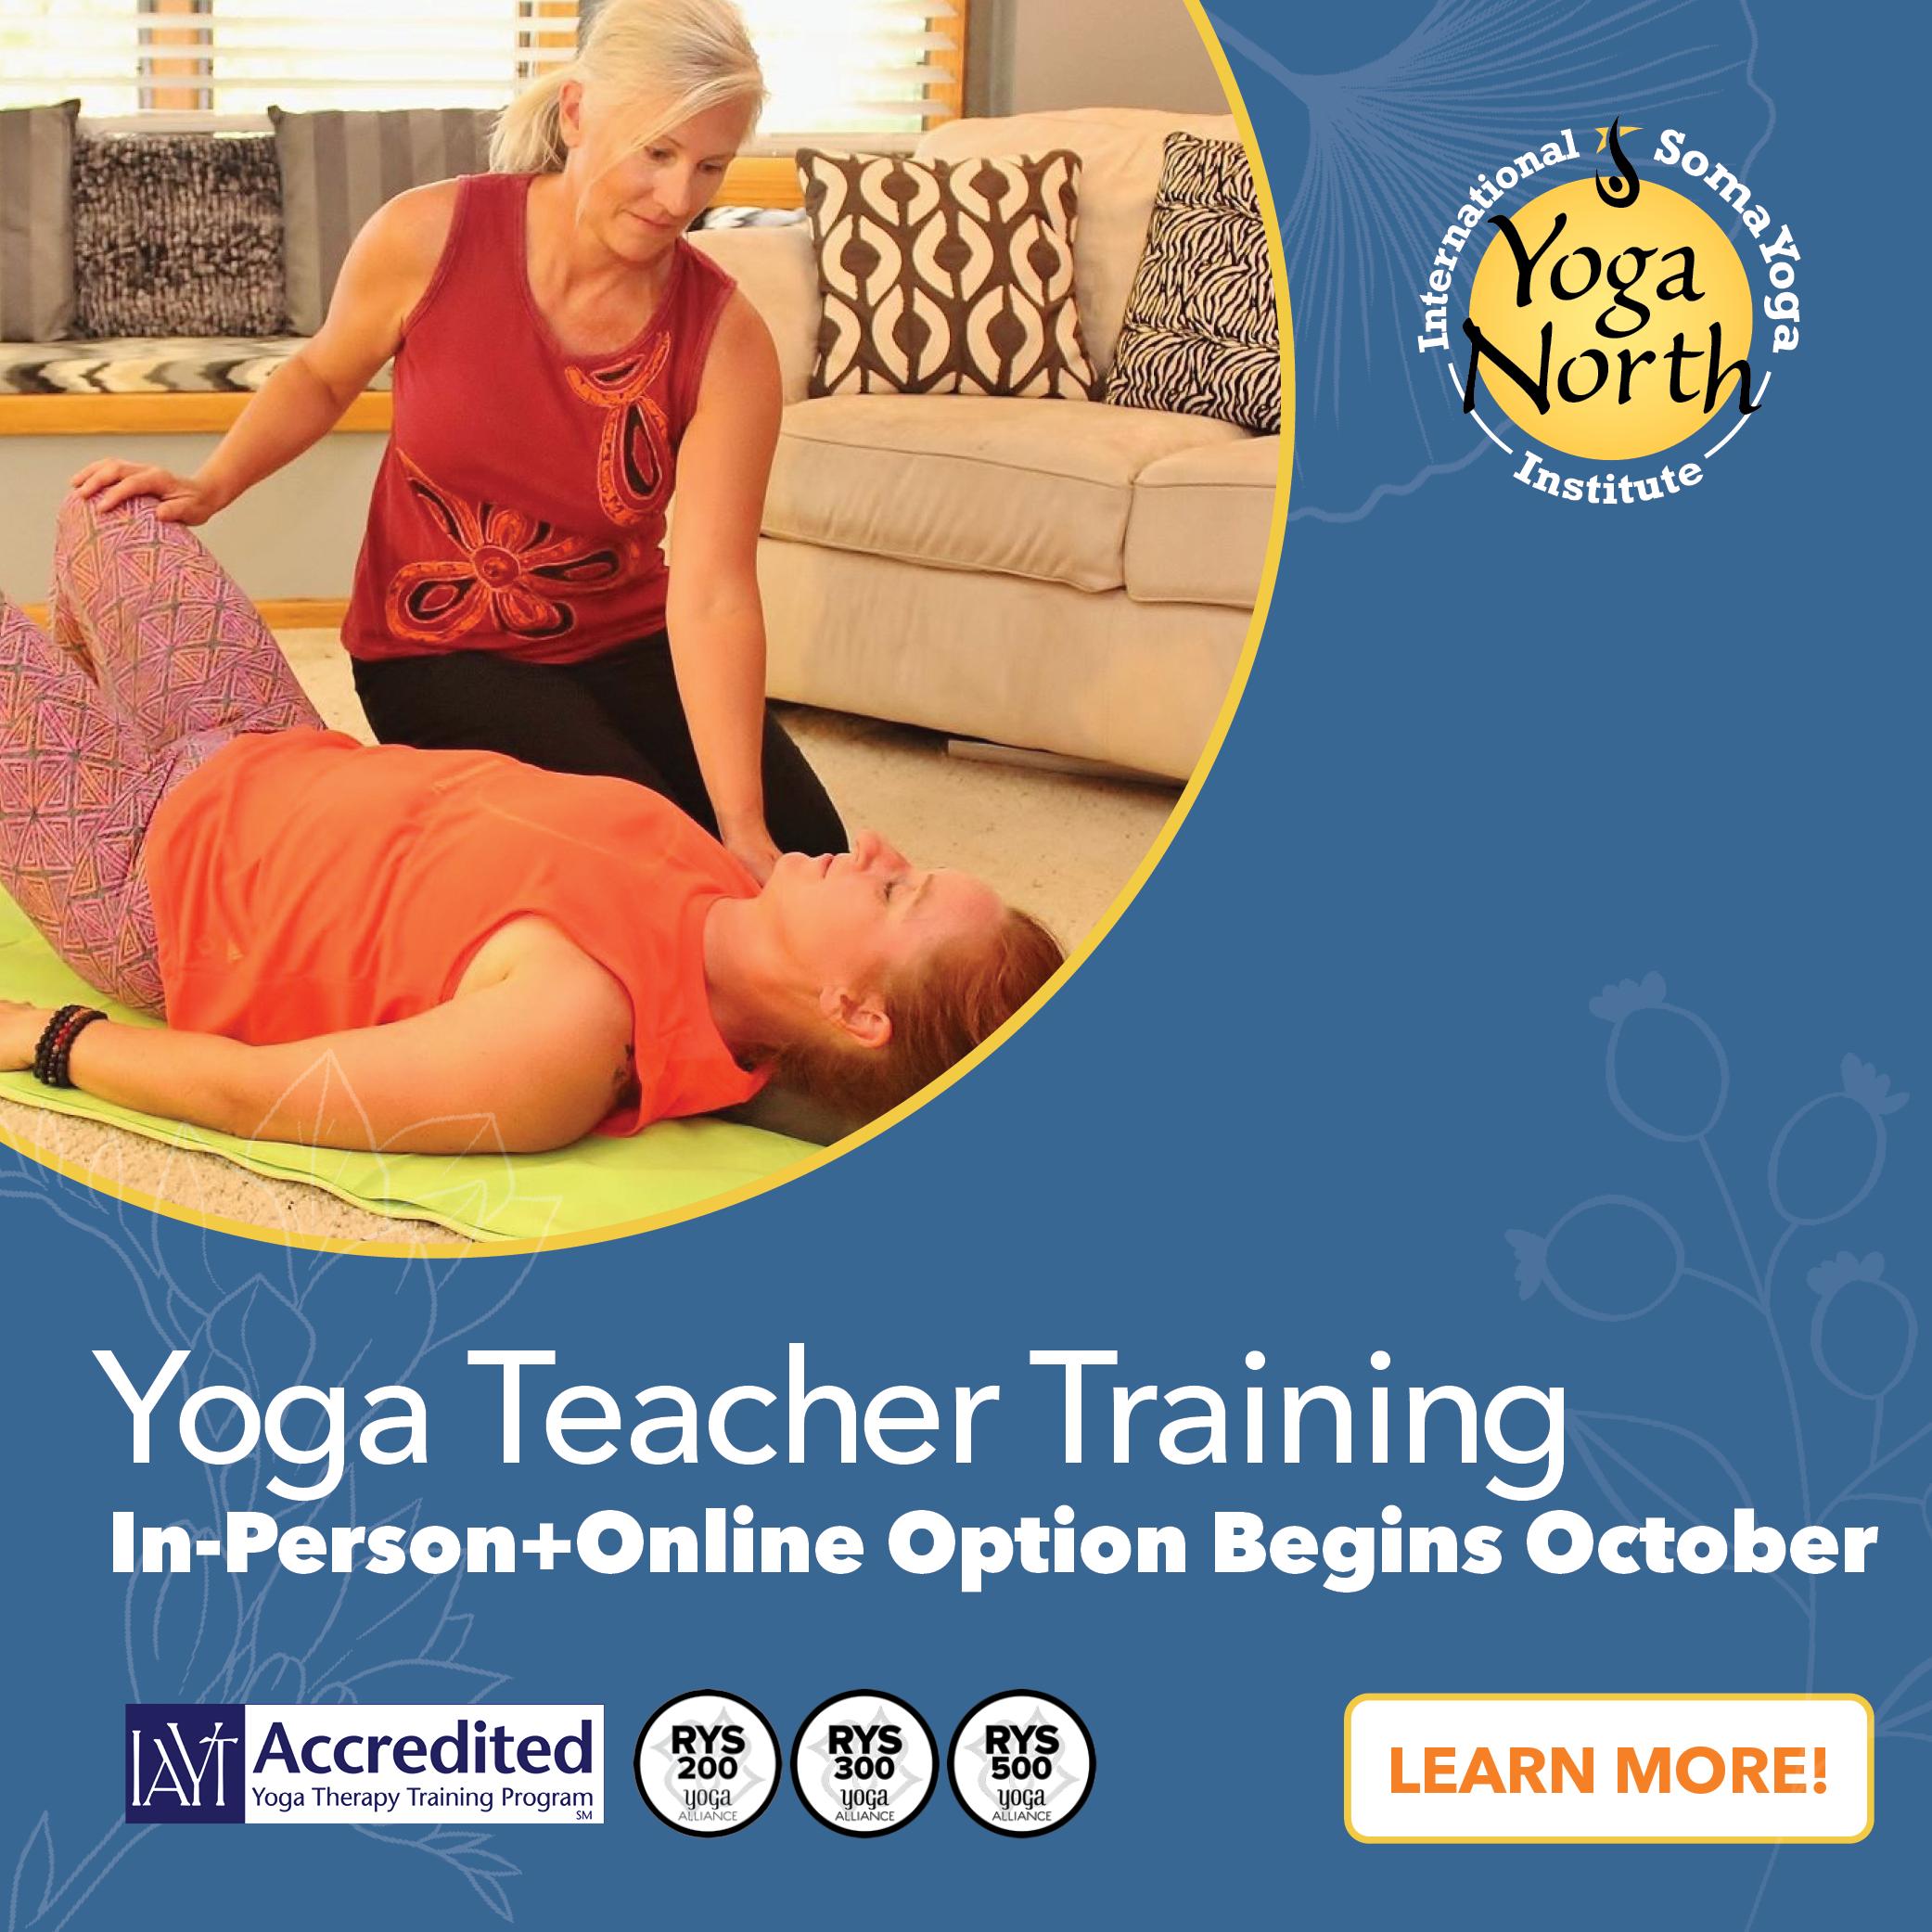 Yoga North ISYI Therapeutic Yoga Teacher Training